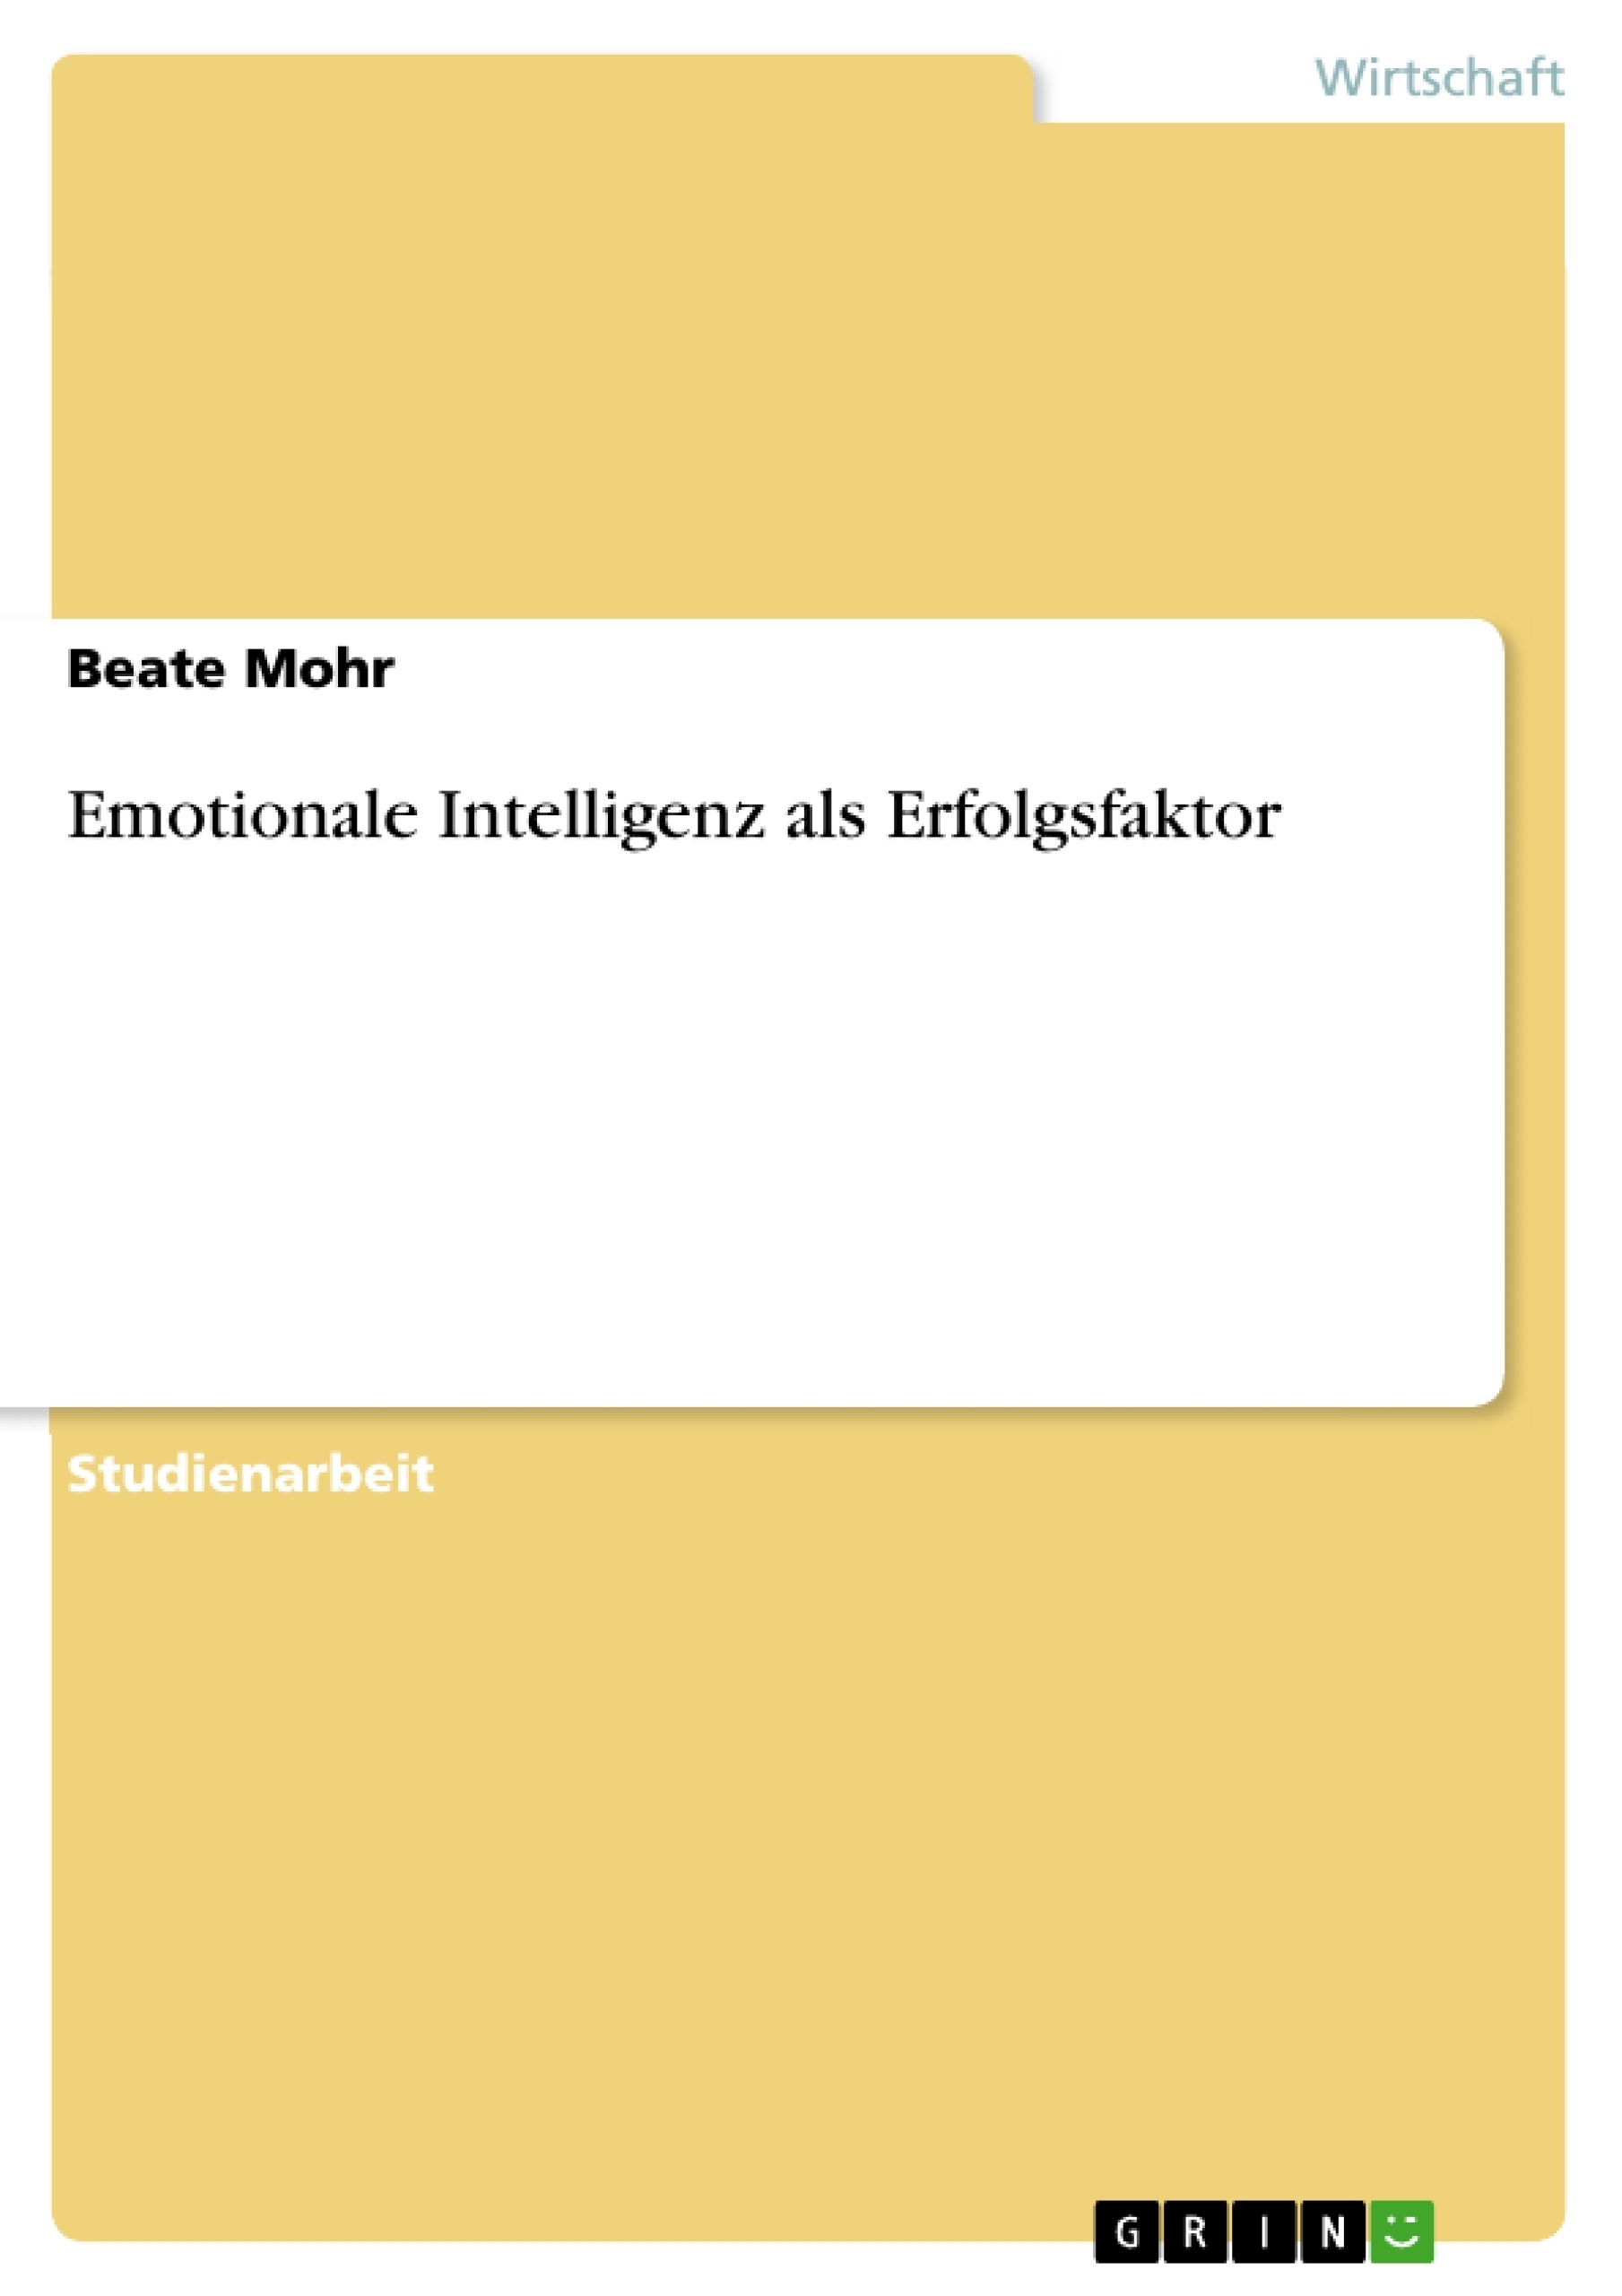 Titel: Emotionale Intelligenz als Erfolgsfaktor